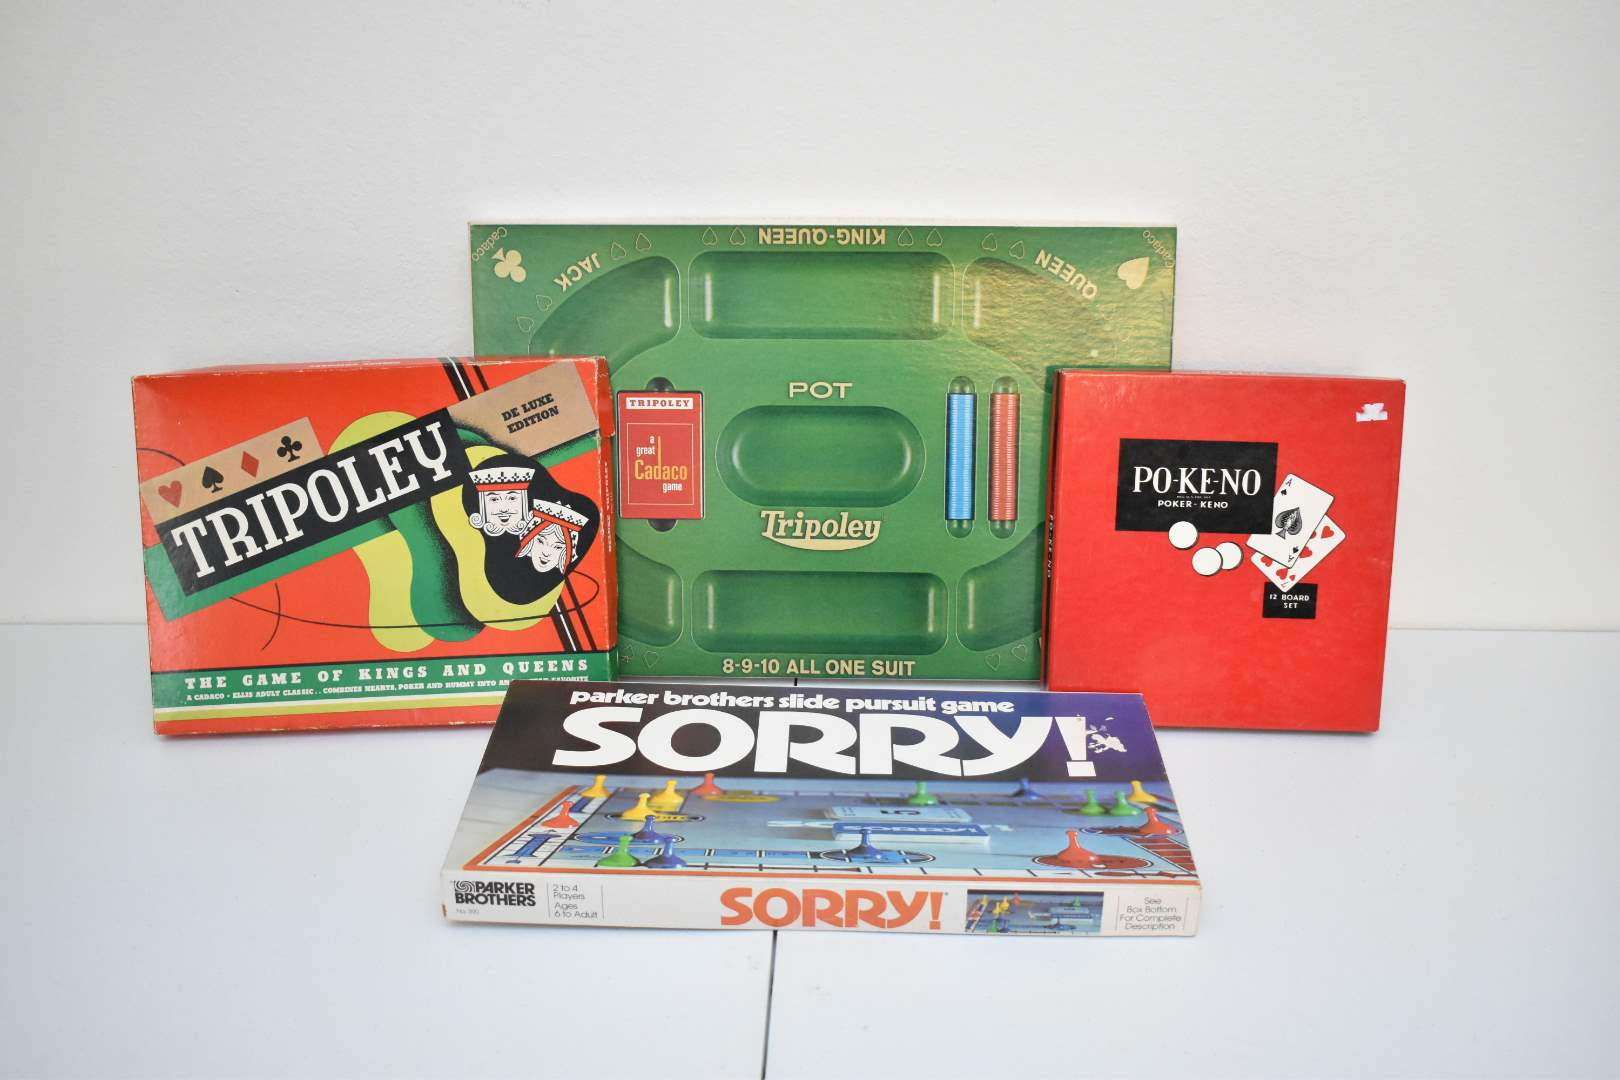 1950's-70's Board Games: Tripoley (1957), Po-Ke-No (1960s), Tripoley (1968), Sorry (1972)